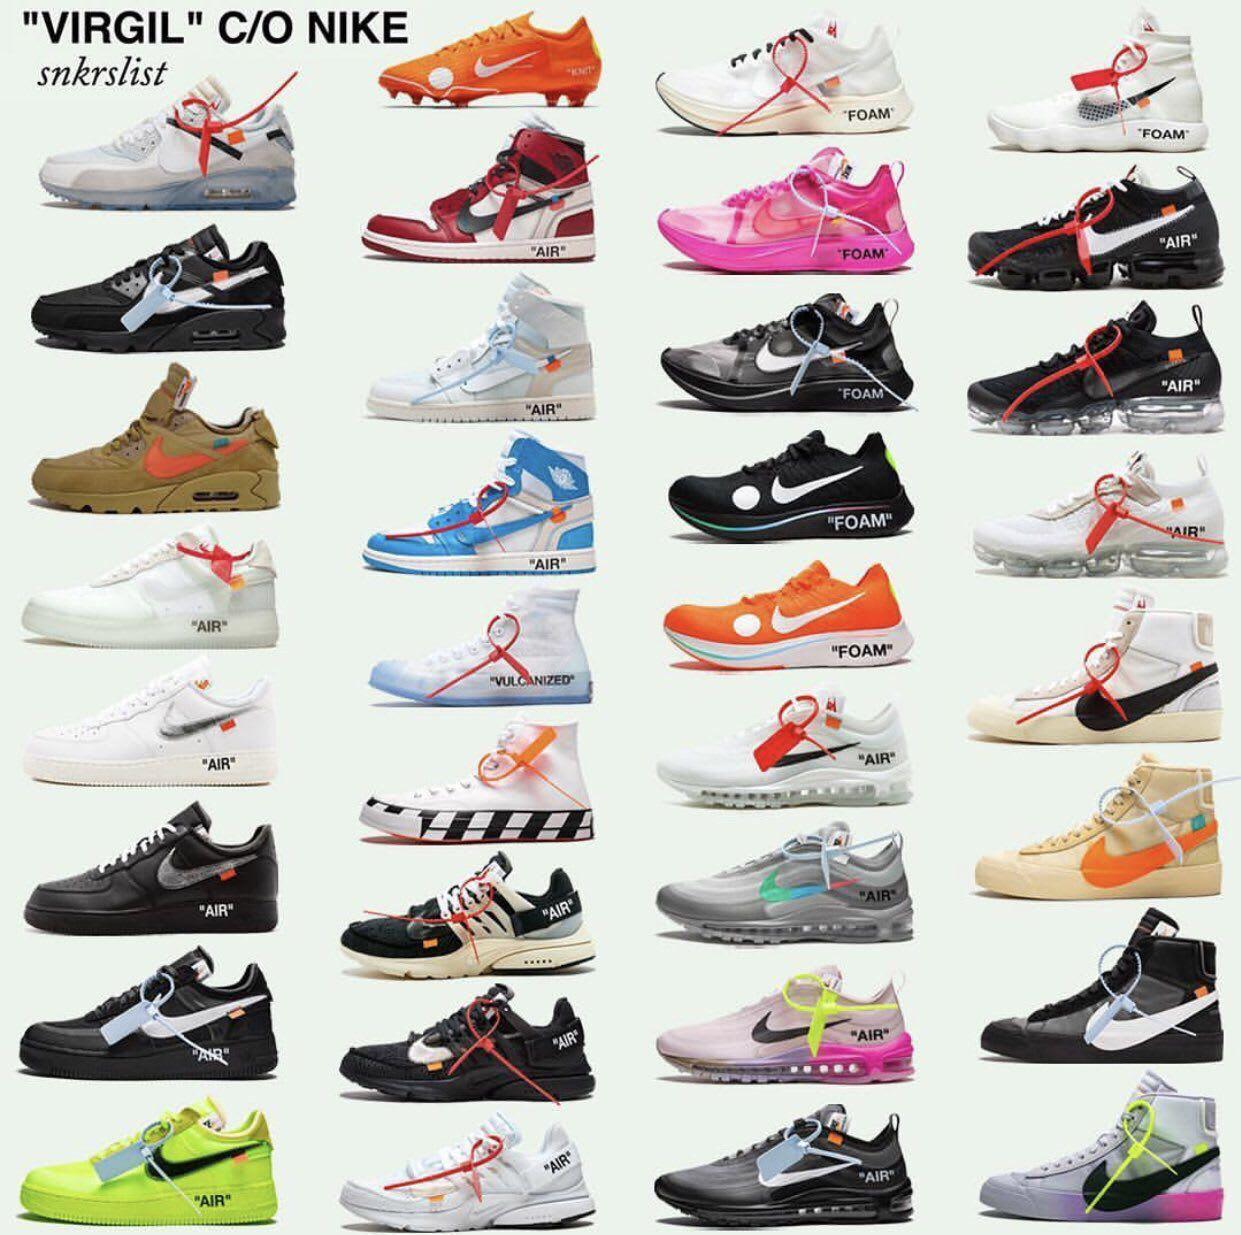 Legit check every nike x off white shoe